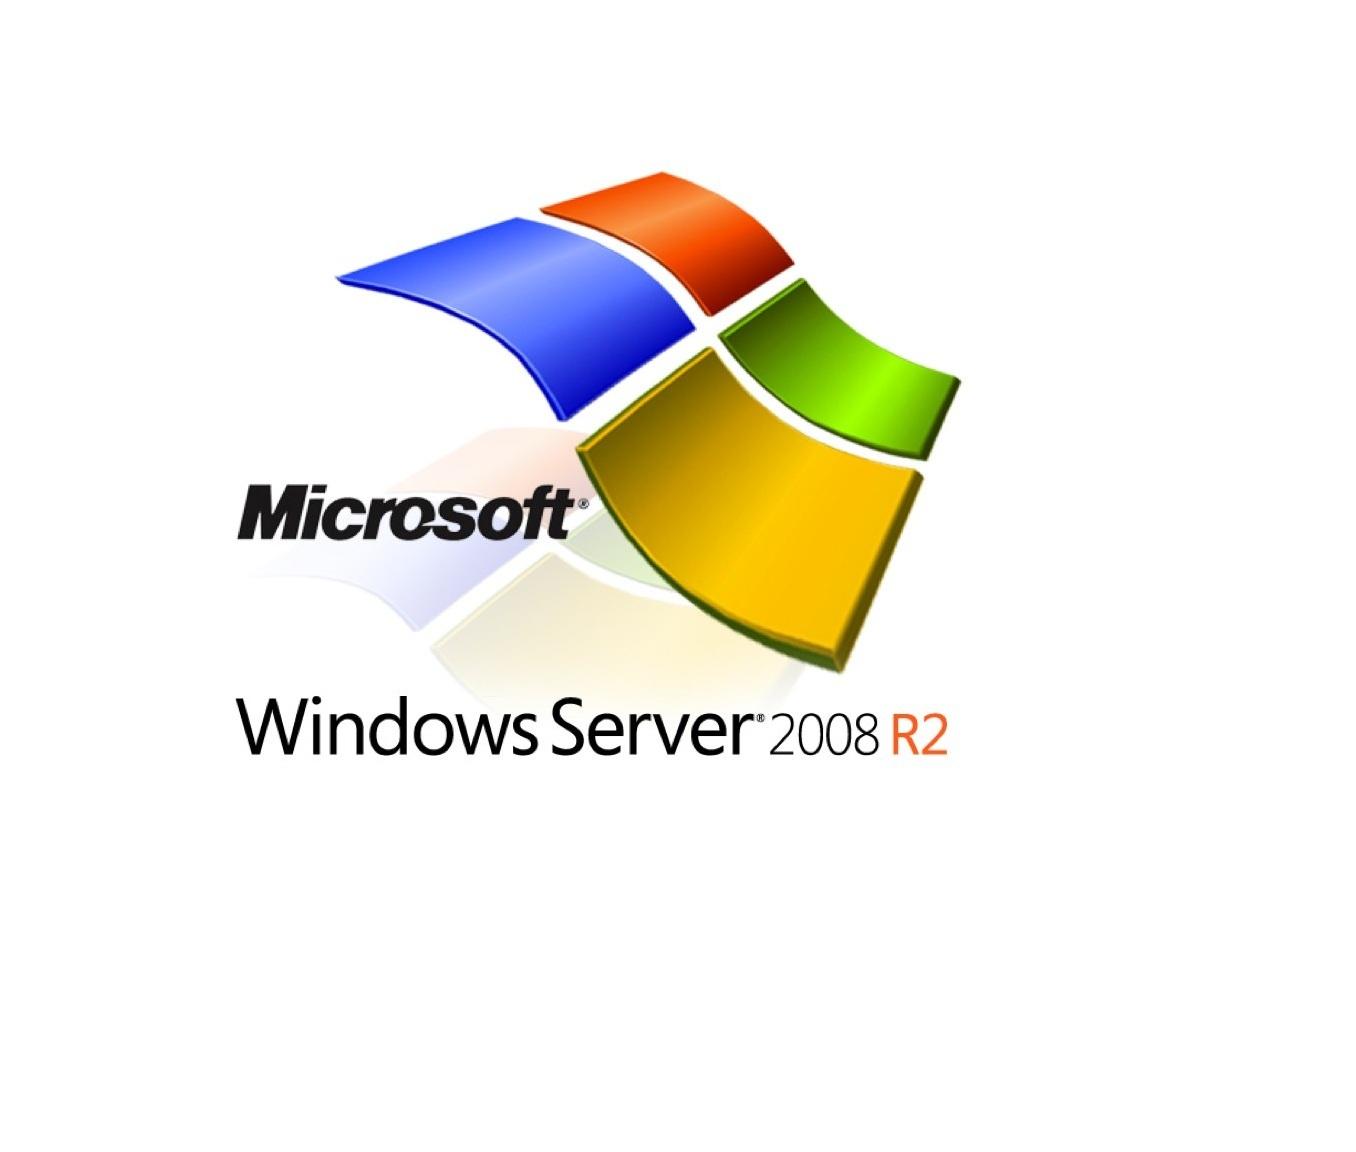 Migrate Server Roles to Windows Server 2008 R2